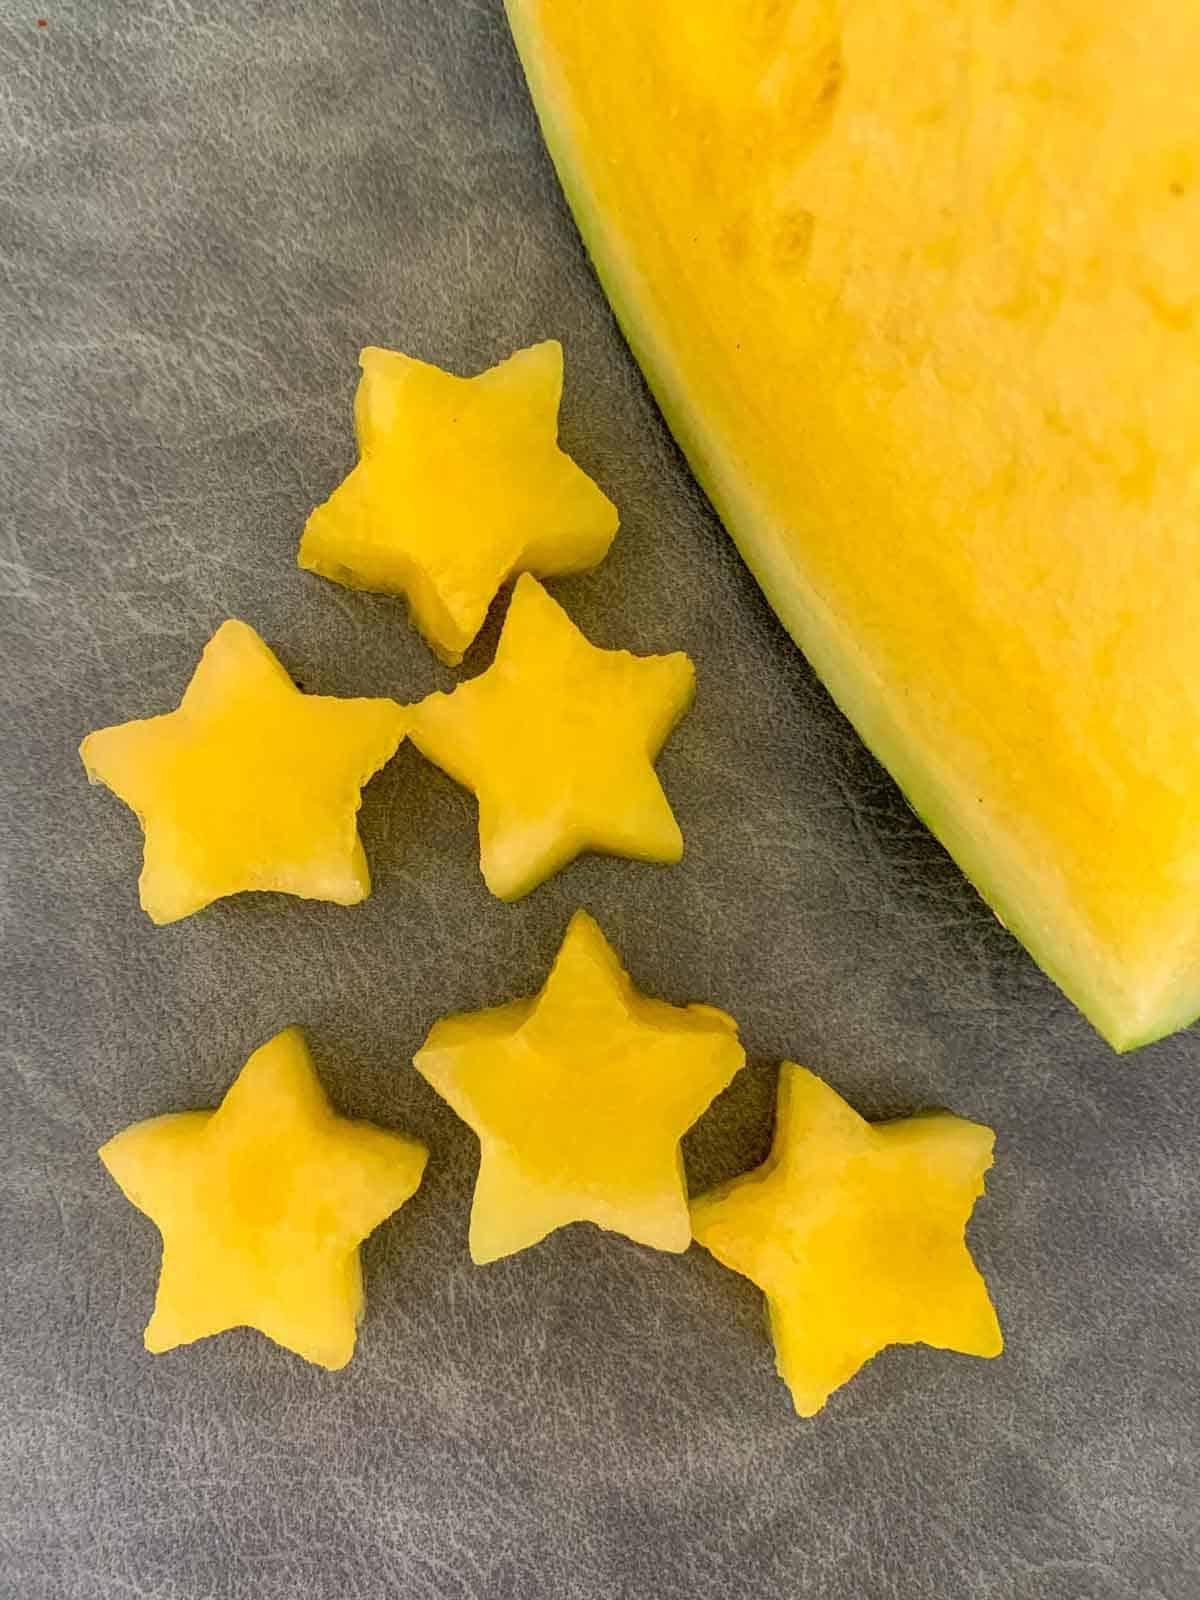 Star shaped yellow watermelon